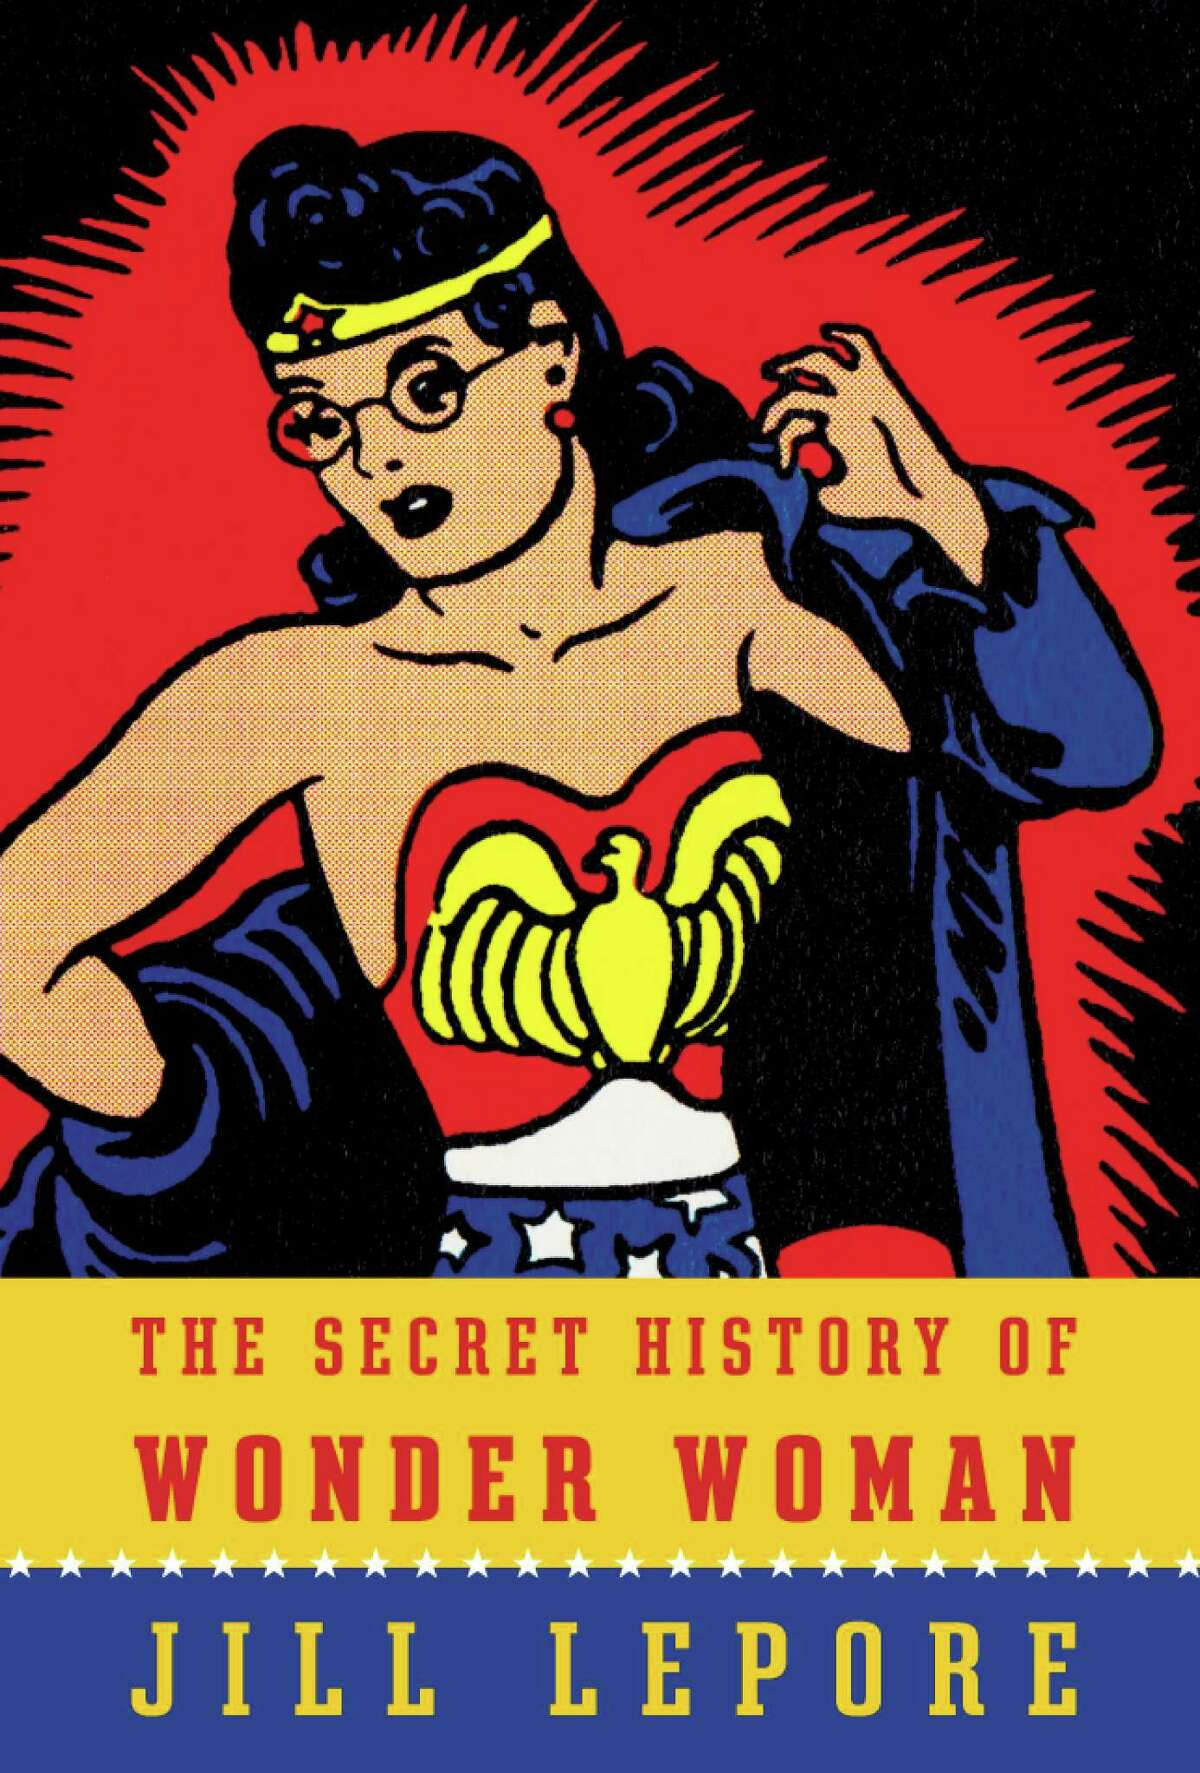 """The Secret History of Wonder Woman,"" by Jill Lepore"